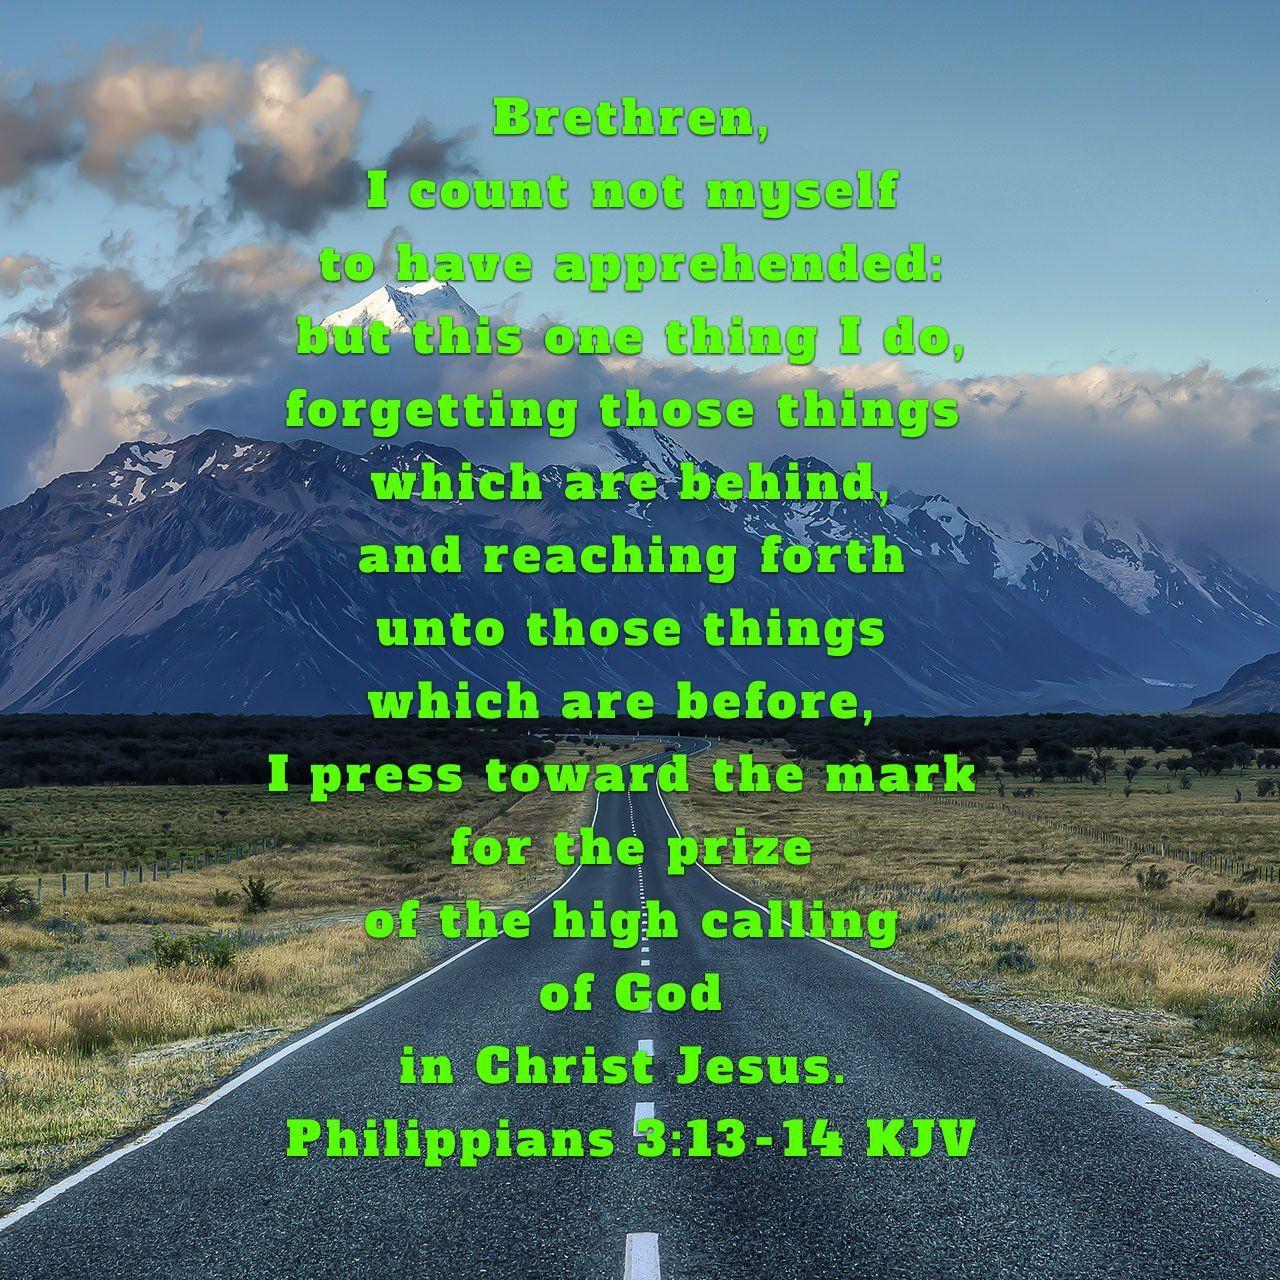 Philippians 3:13-14 KJV | Faith verses, King james bible, Philippians